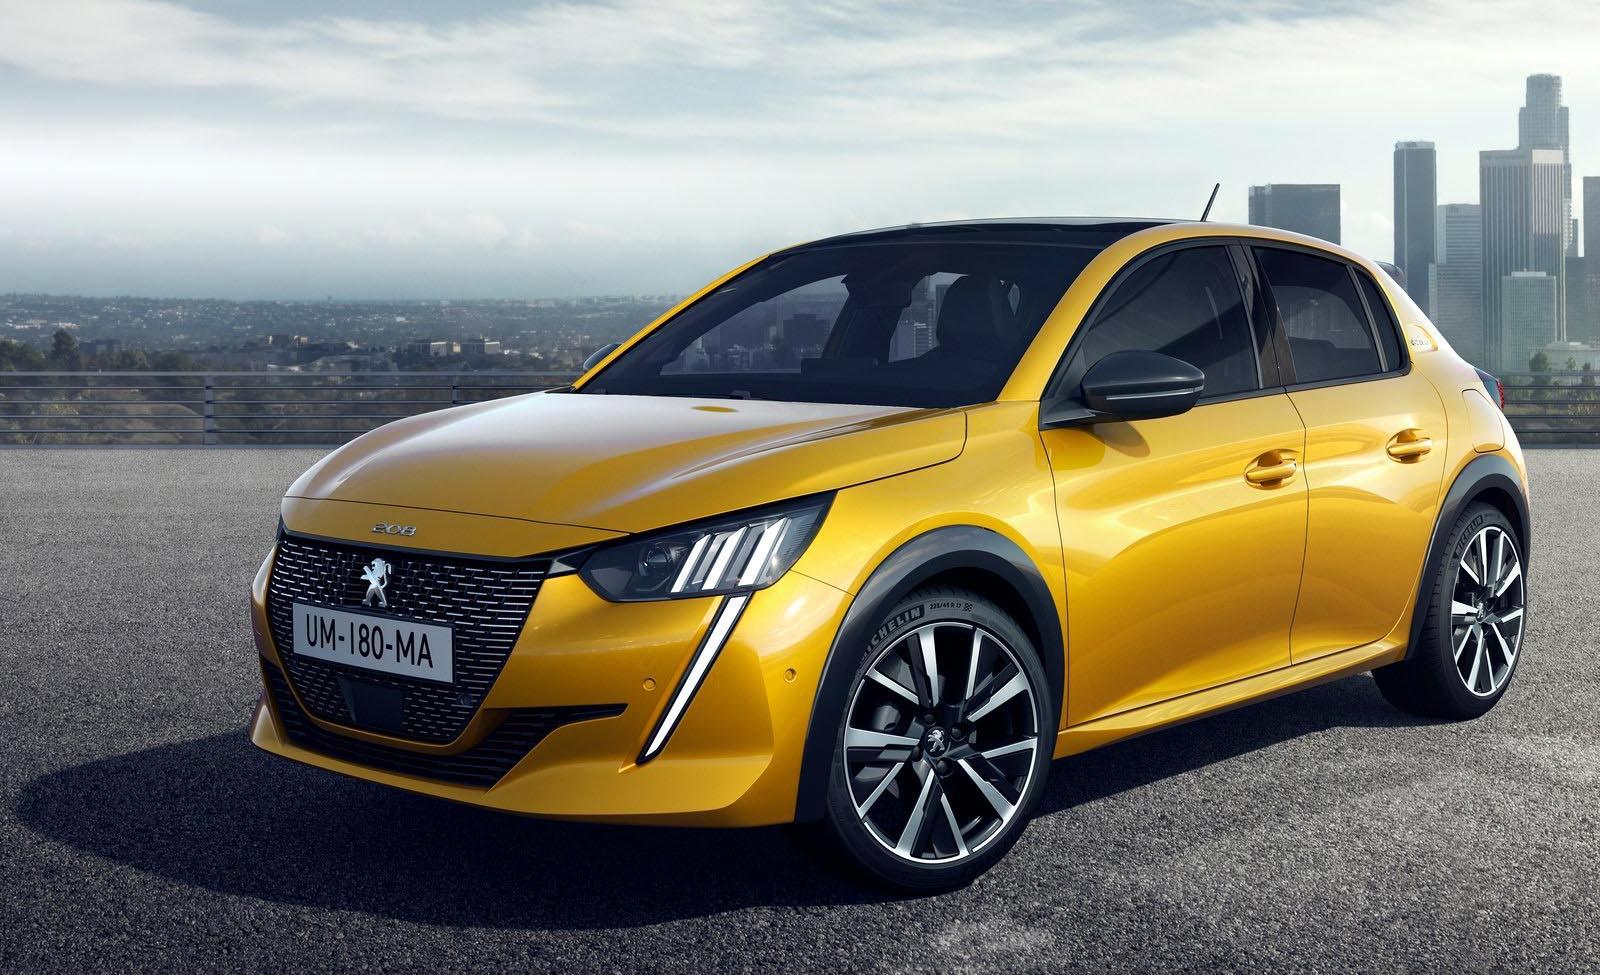 Photo of To νέο Peugeot 208 έχει από ηλεκτρική μέχρι και GTI έκδοση!